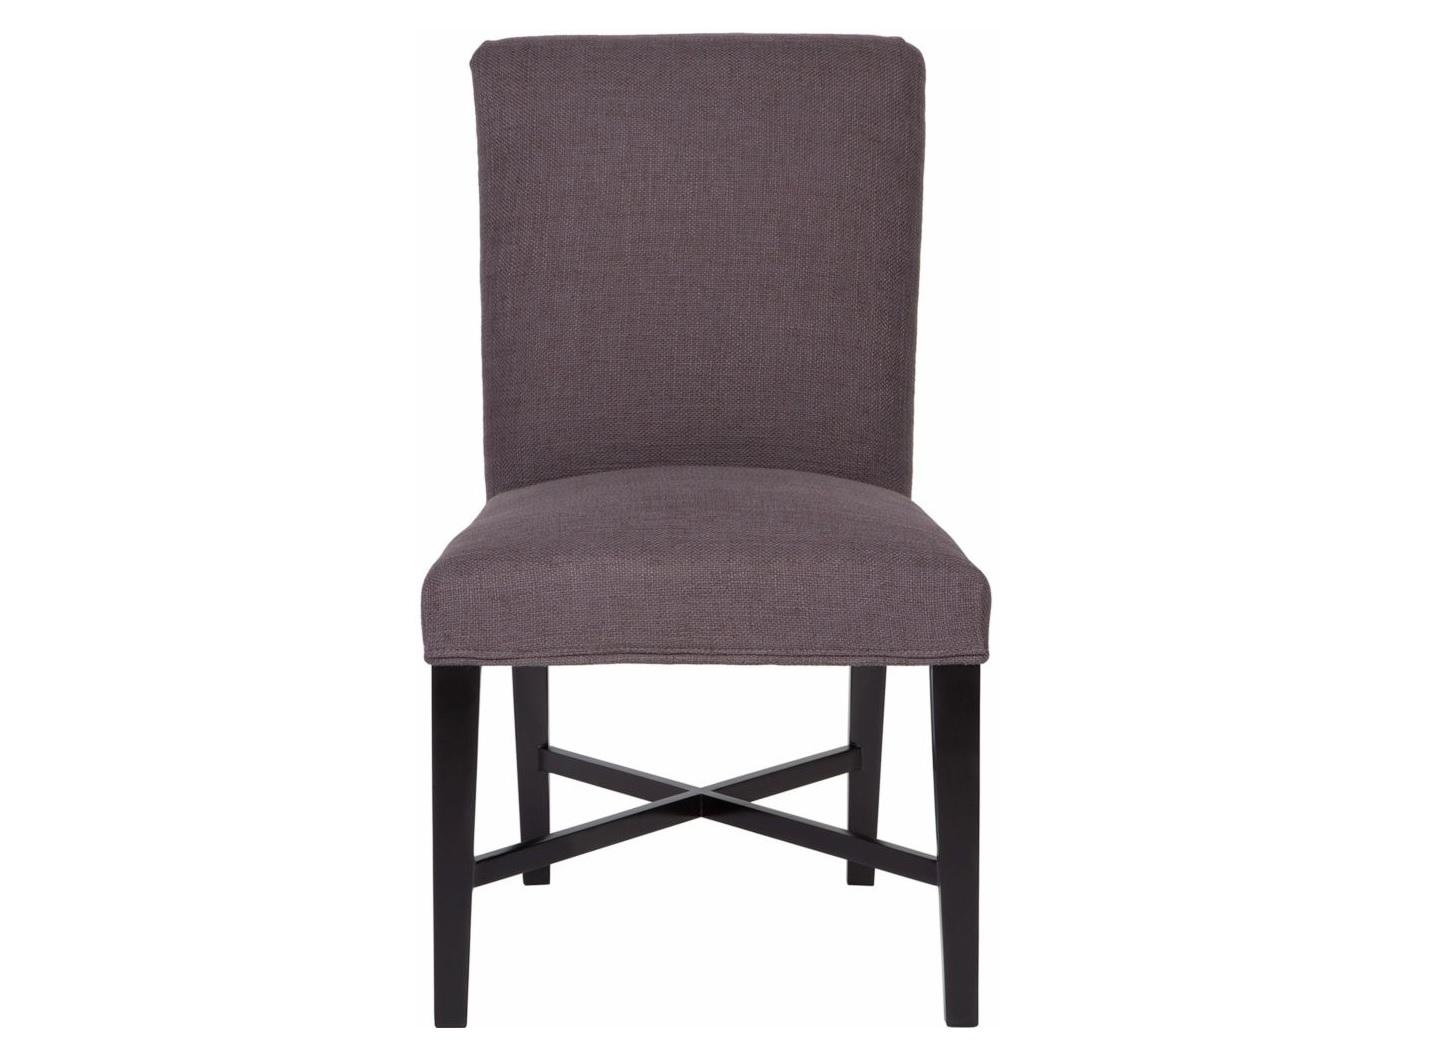 Кухонный стул M-Style 15433566 от thefurnish